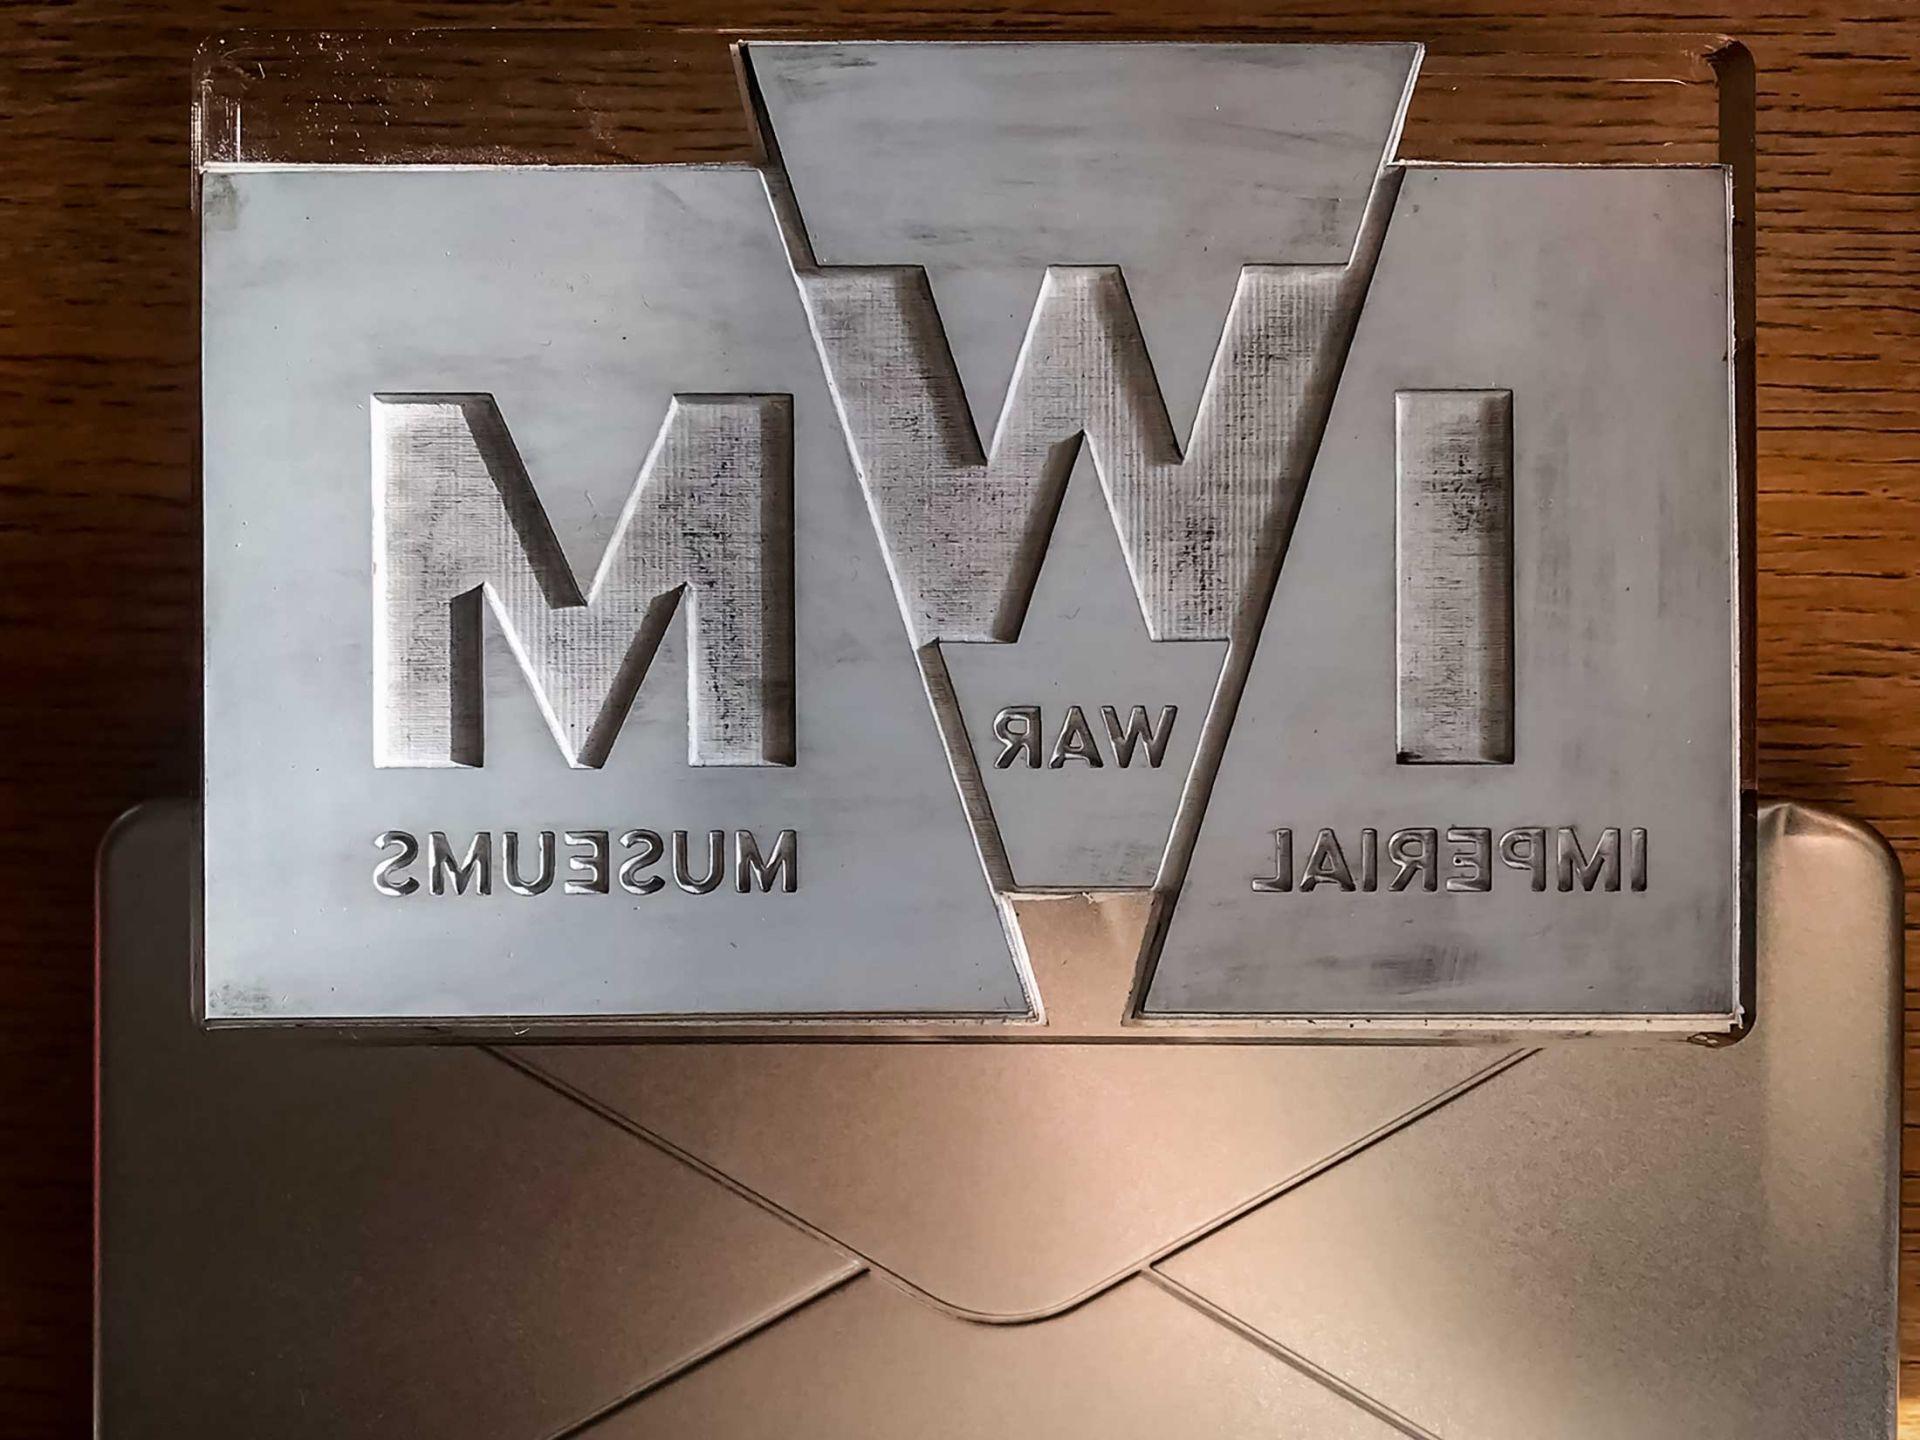 Imperial war museum metal embossed logo with metal envelope tin.